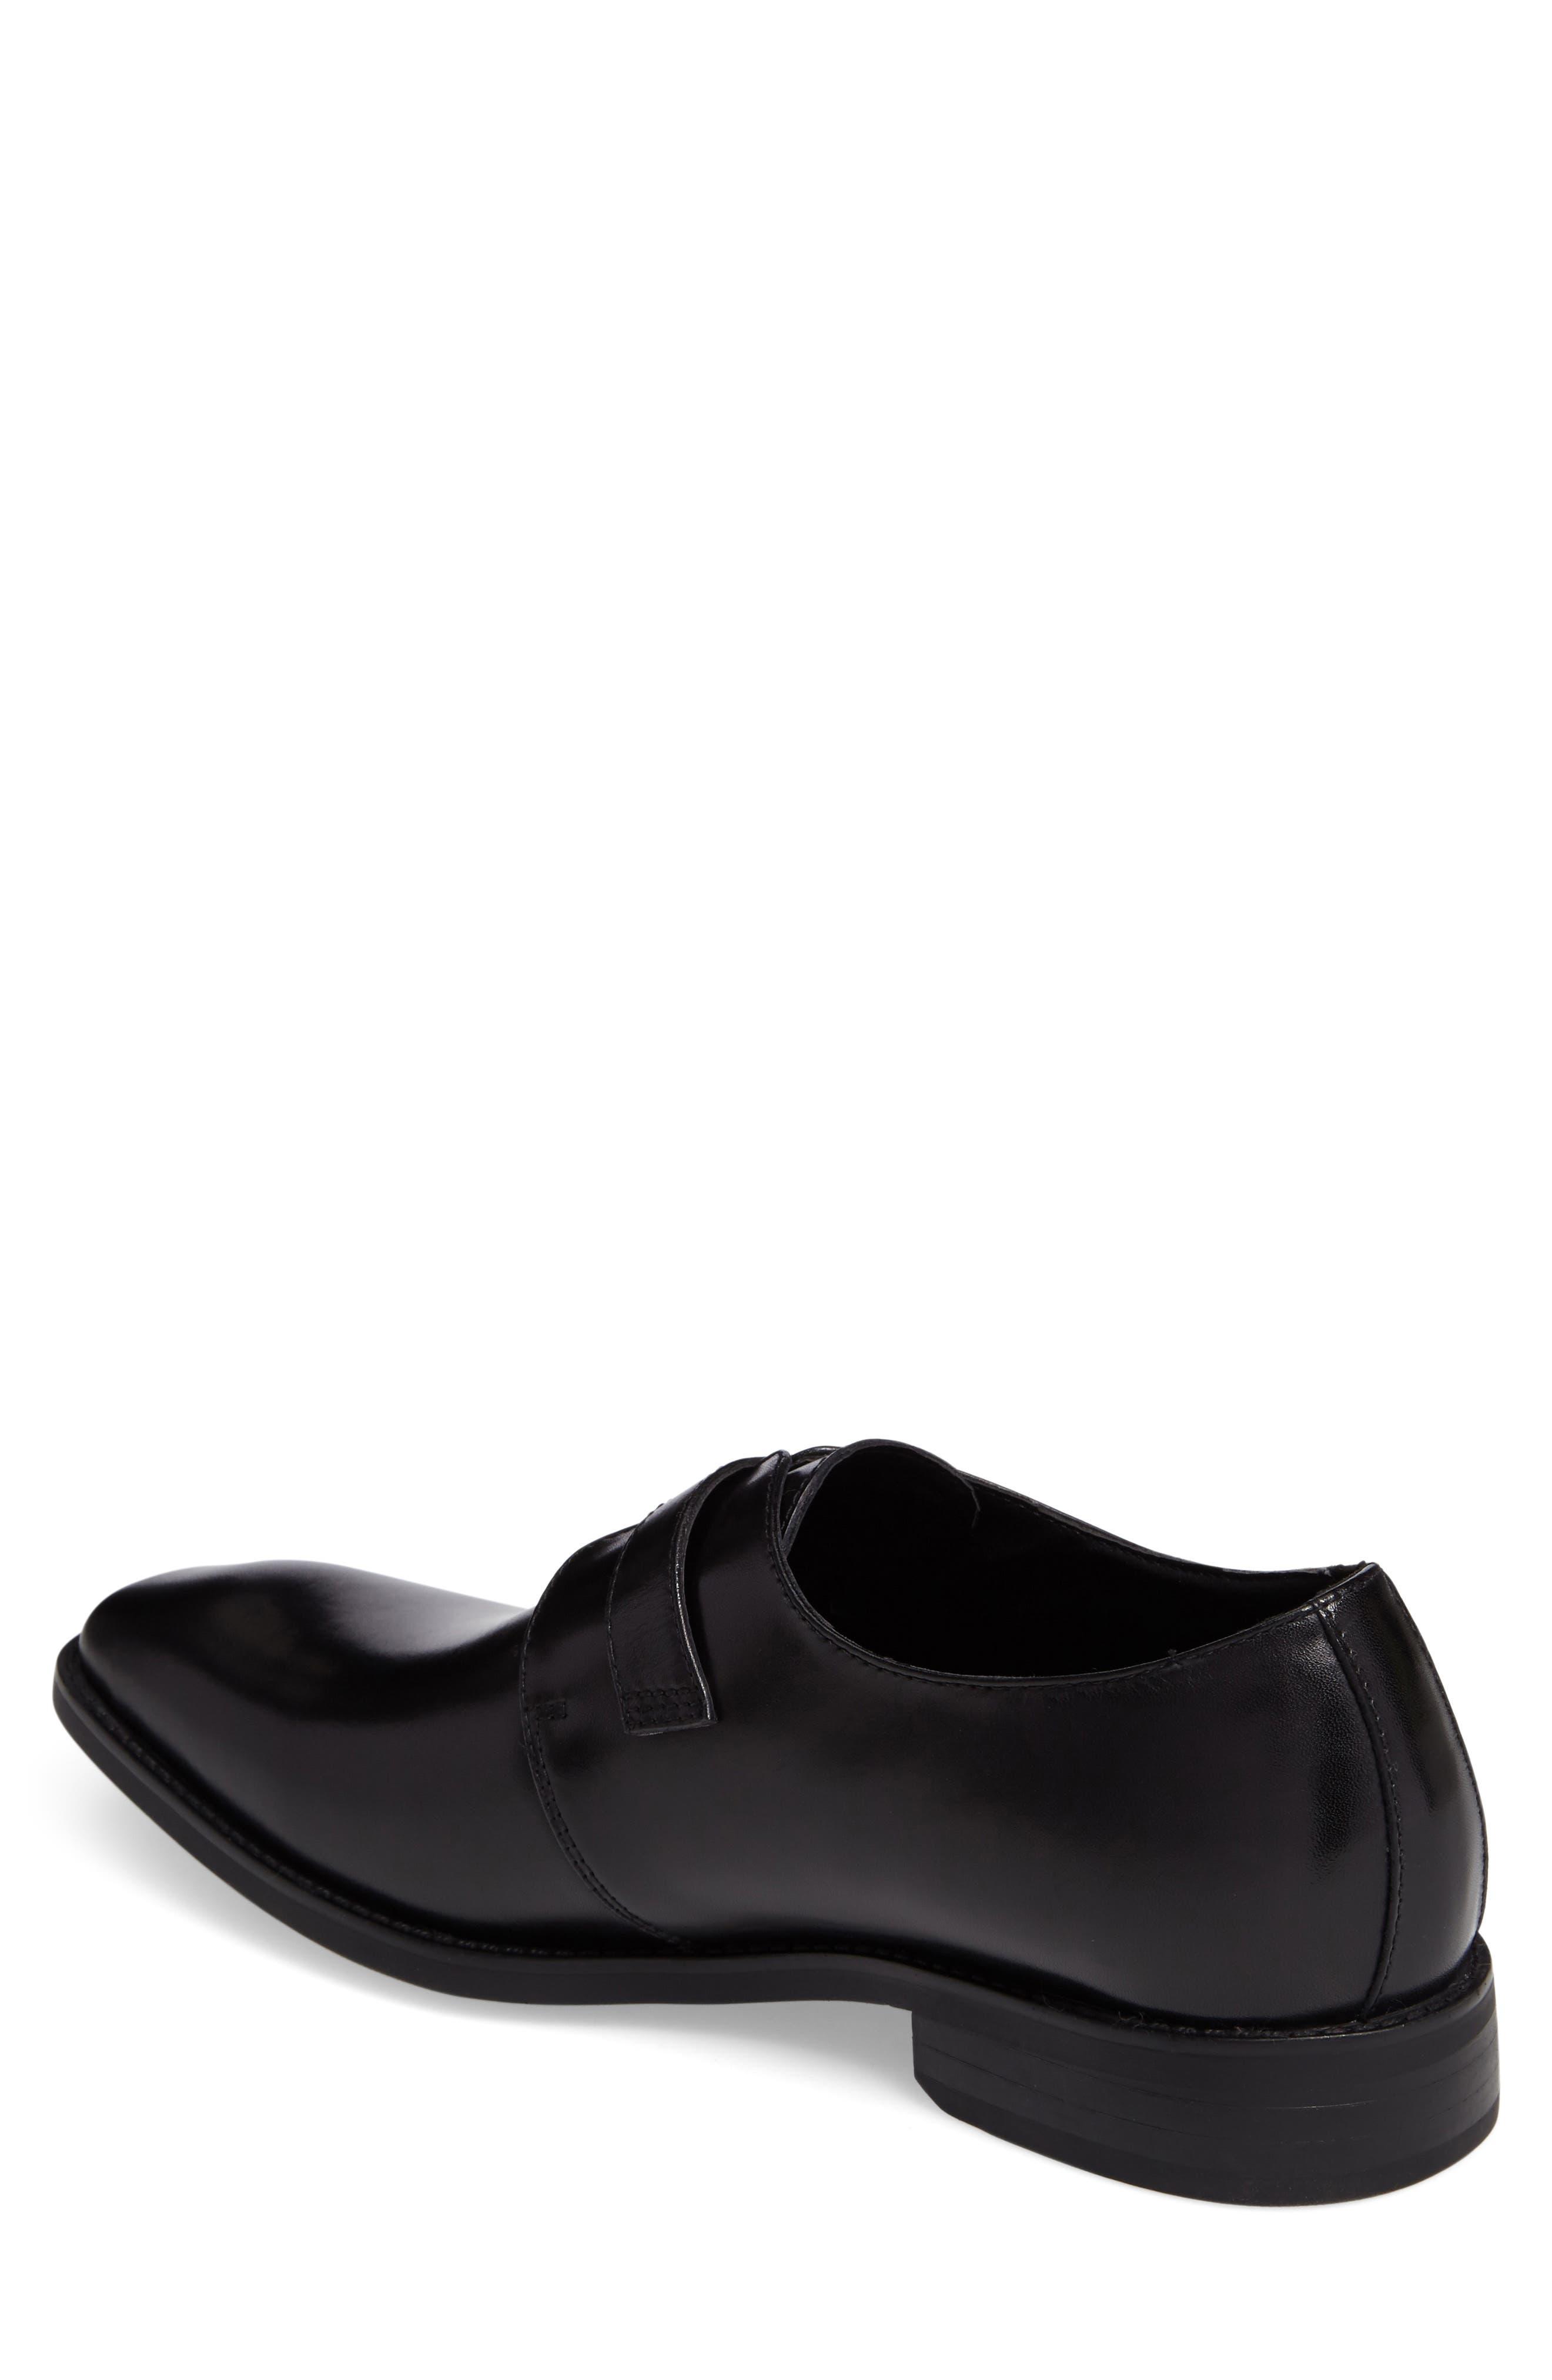 Landon Monk Strap Shoe,                             Alternate thumbnail 2, color,                             001